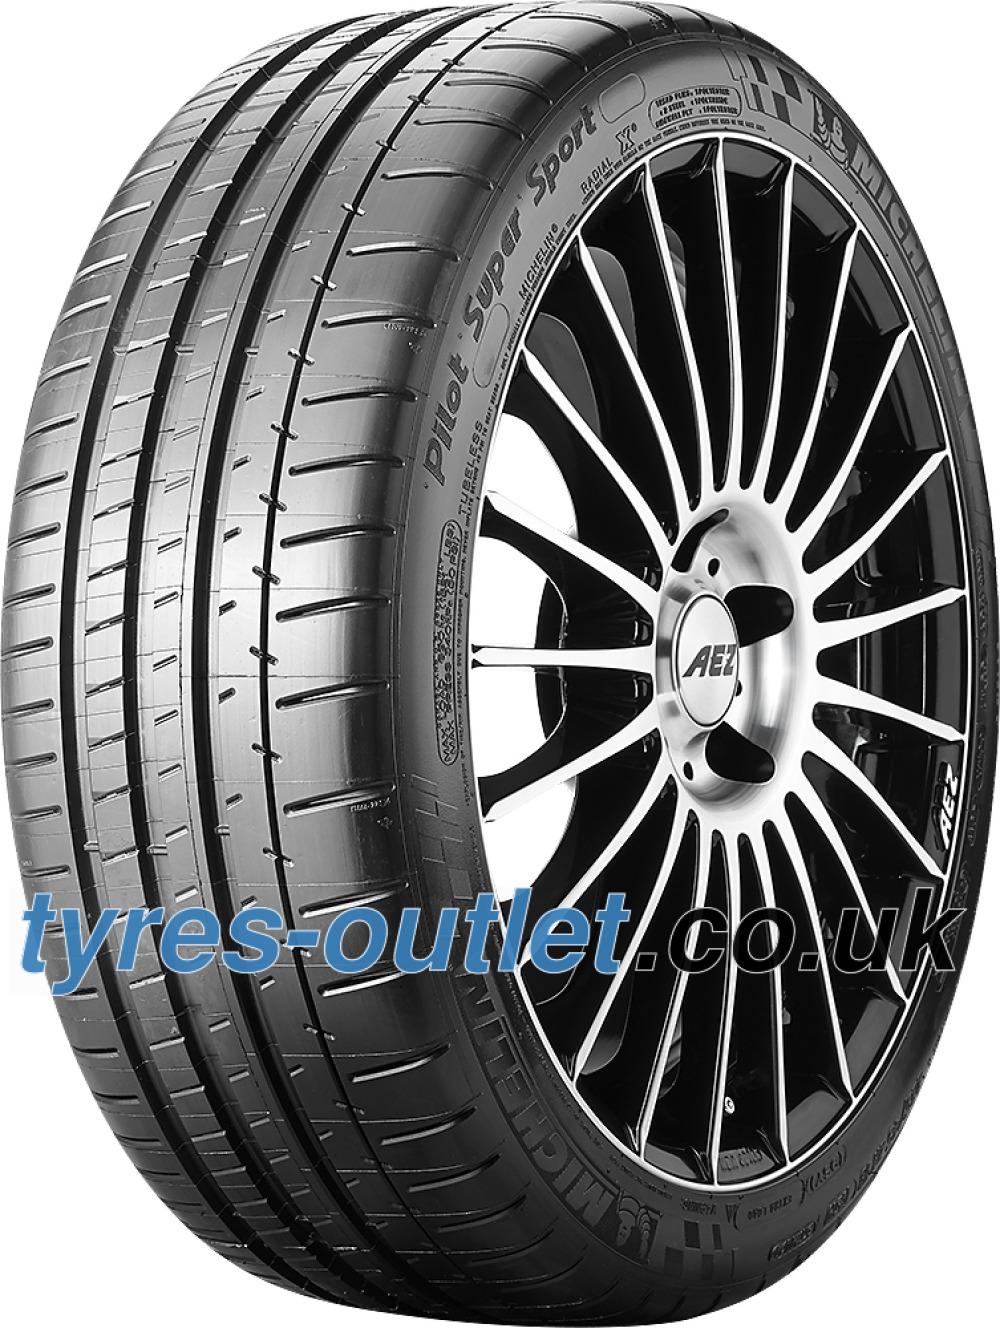 Michelin Pilot Super Sport ( 245/30 ZR19 (89Y) XL with rim protection ridge (FSL) )